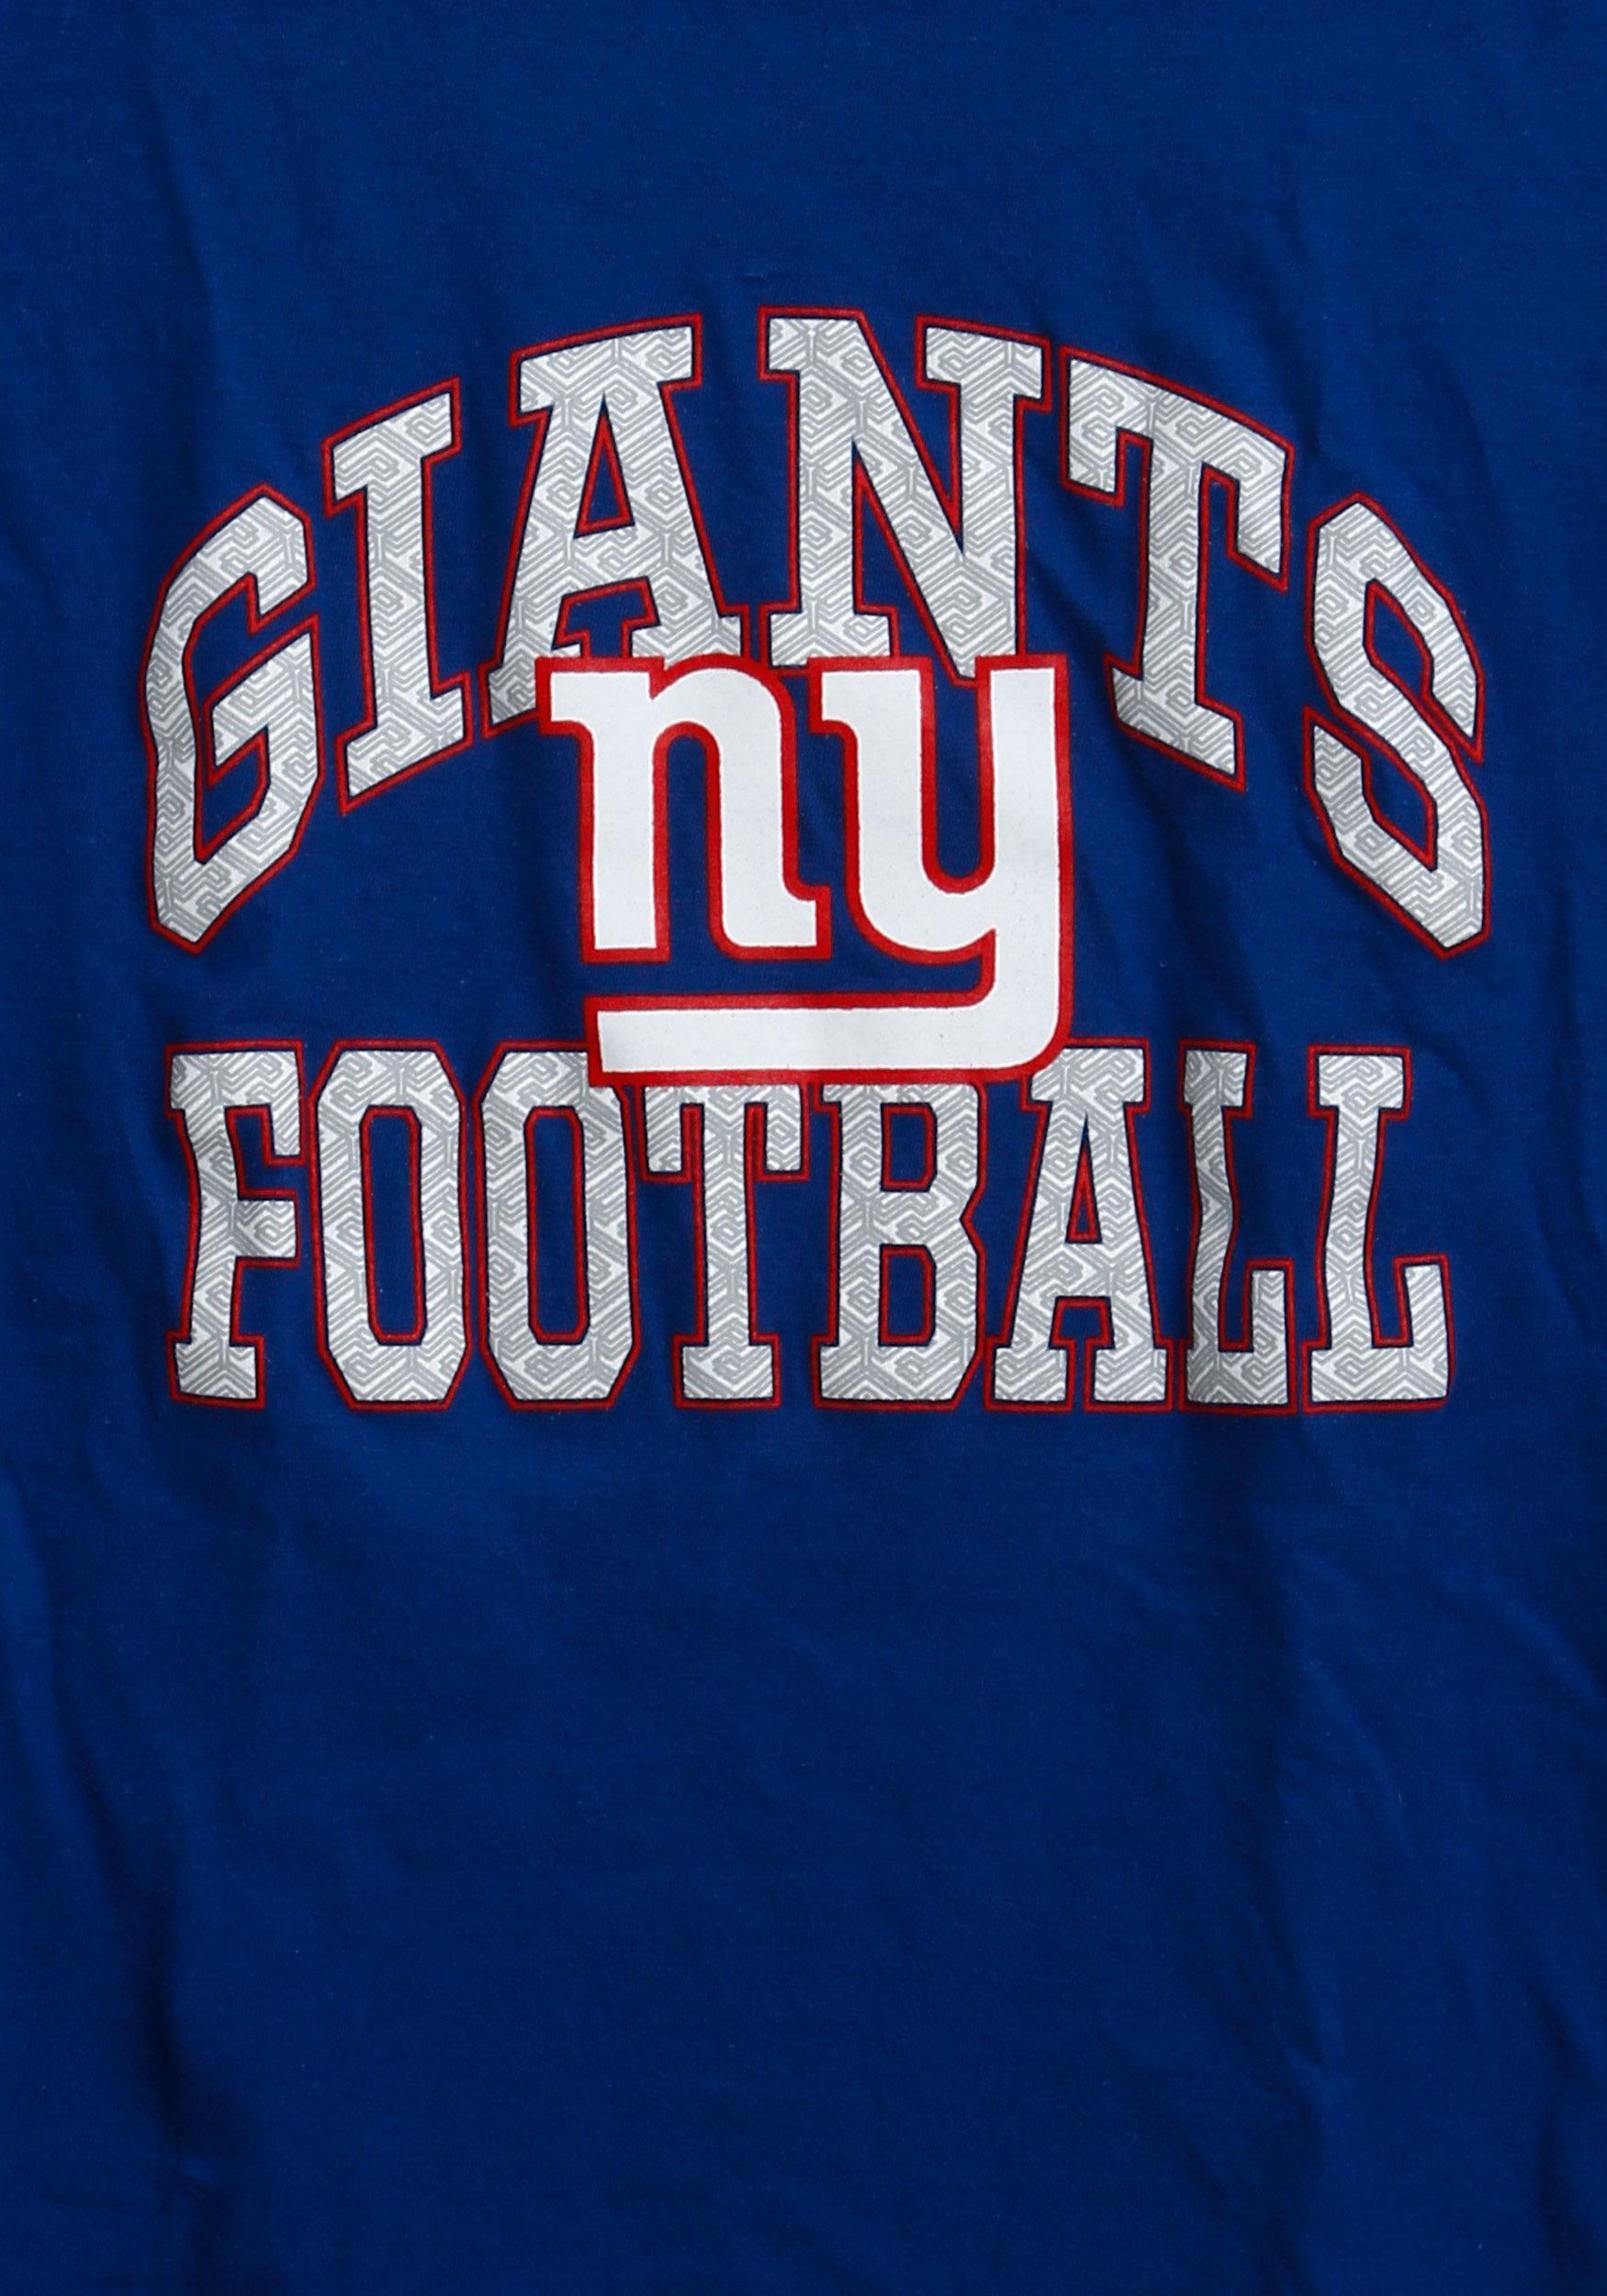 d7a5a01b8 New York Giants Franchise Fit Womens T-Shirt2